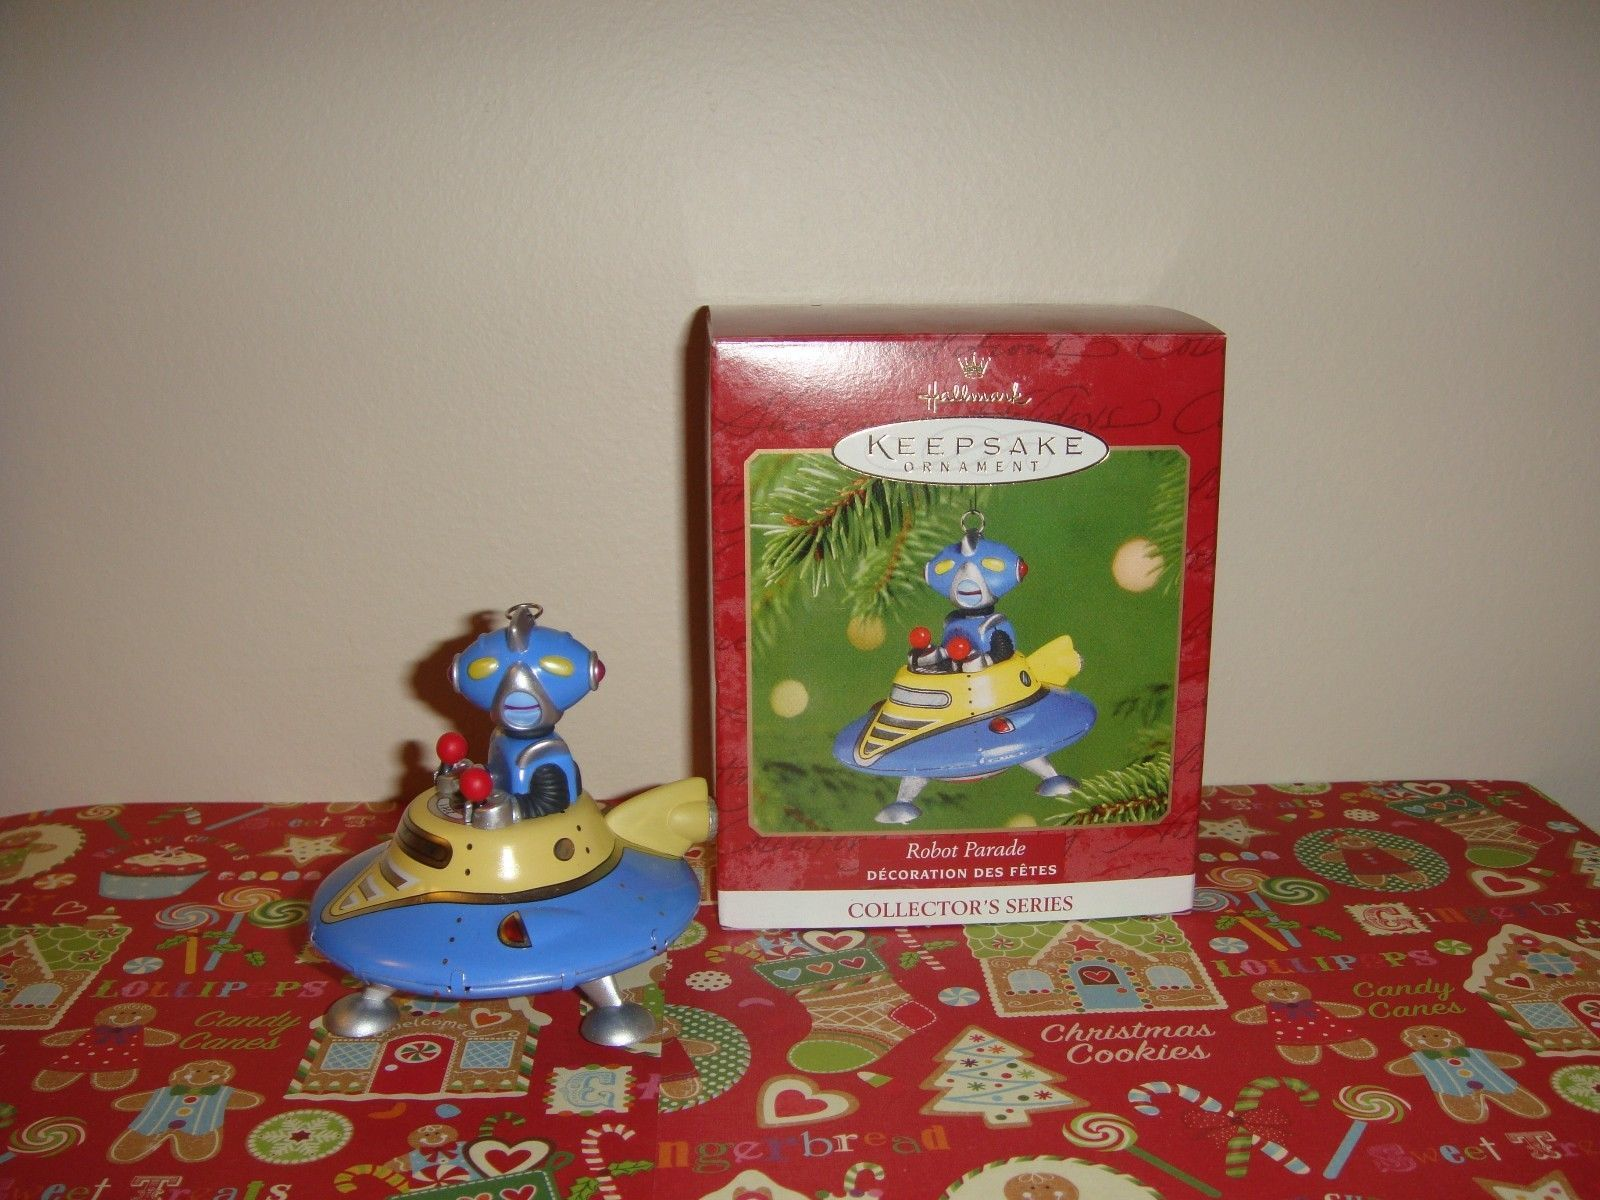 Hallmark 2001 Robot Parade 2nd In Series Ornament